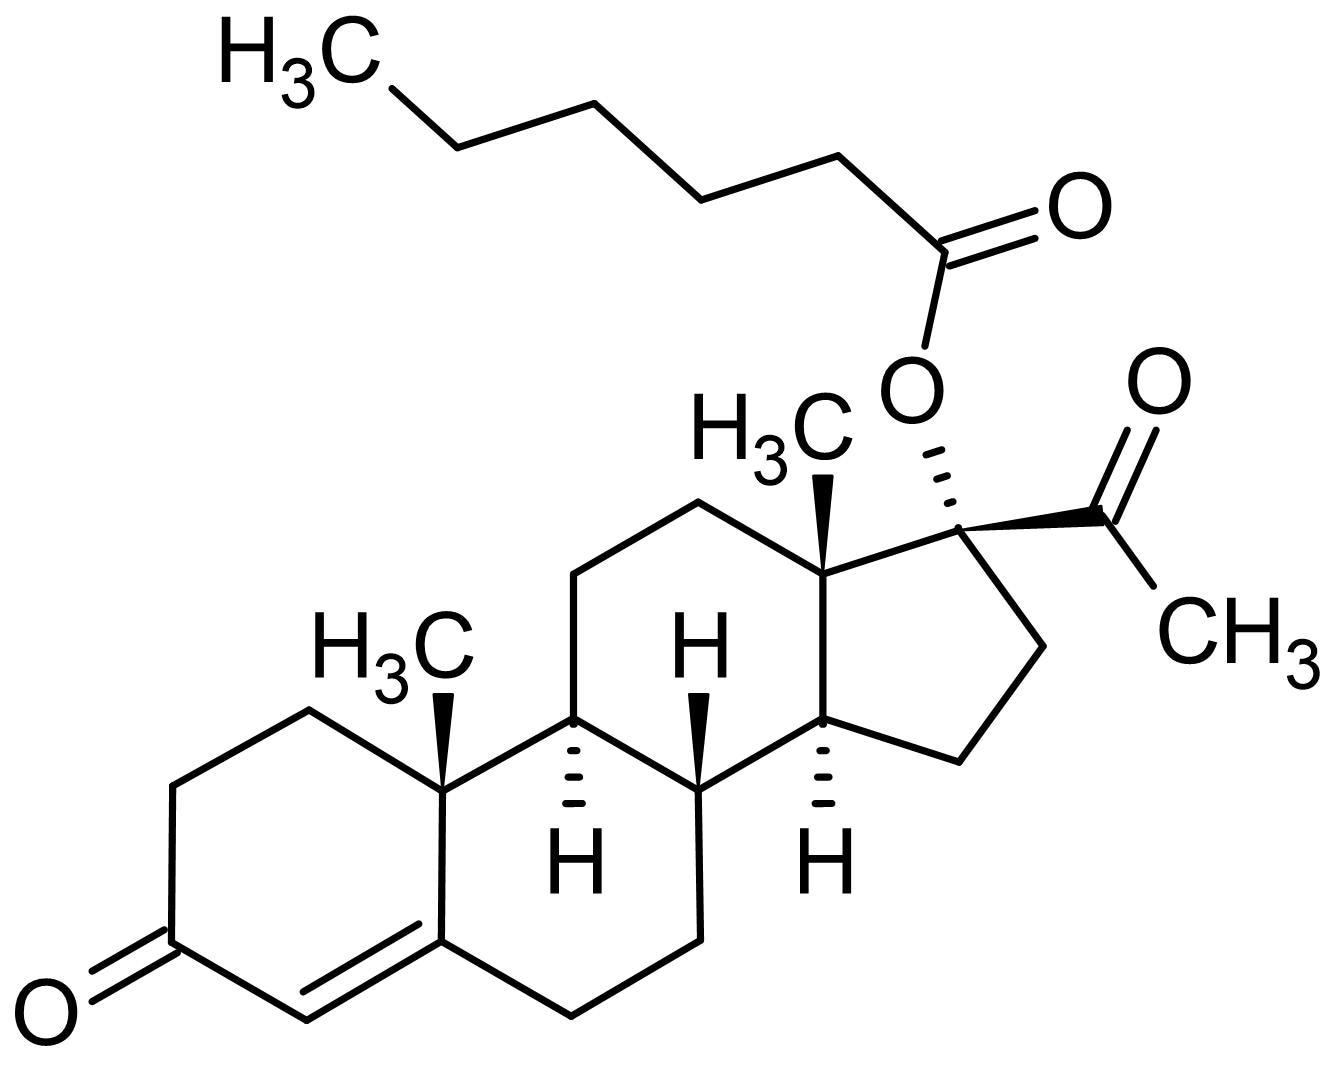 Chemical Structure - 17alpha-Hydroxyprogesterone caproate (17-OHP), anti-estrogen (ab142640)